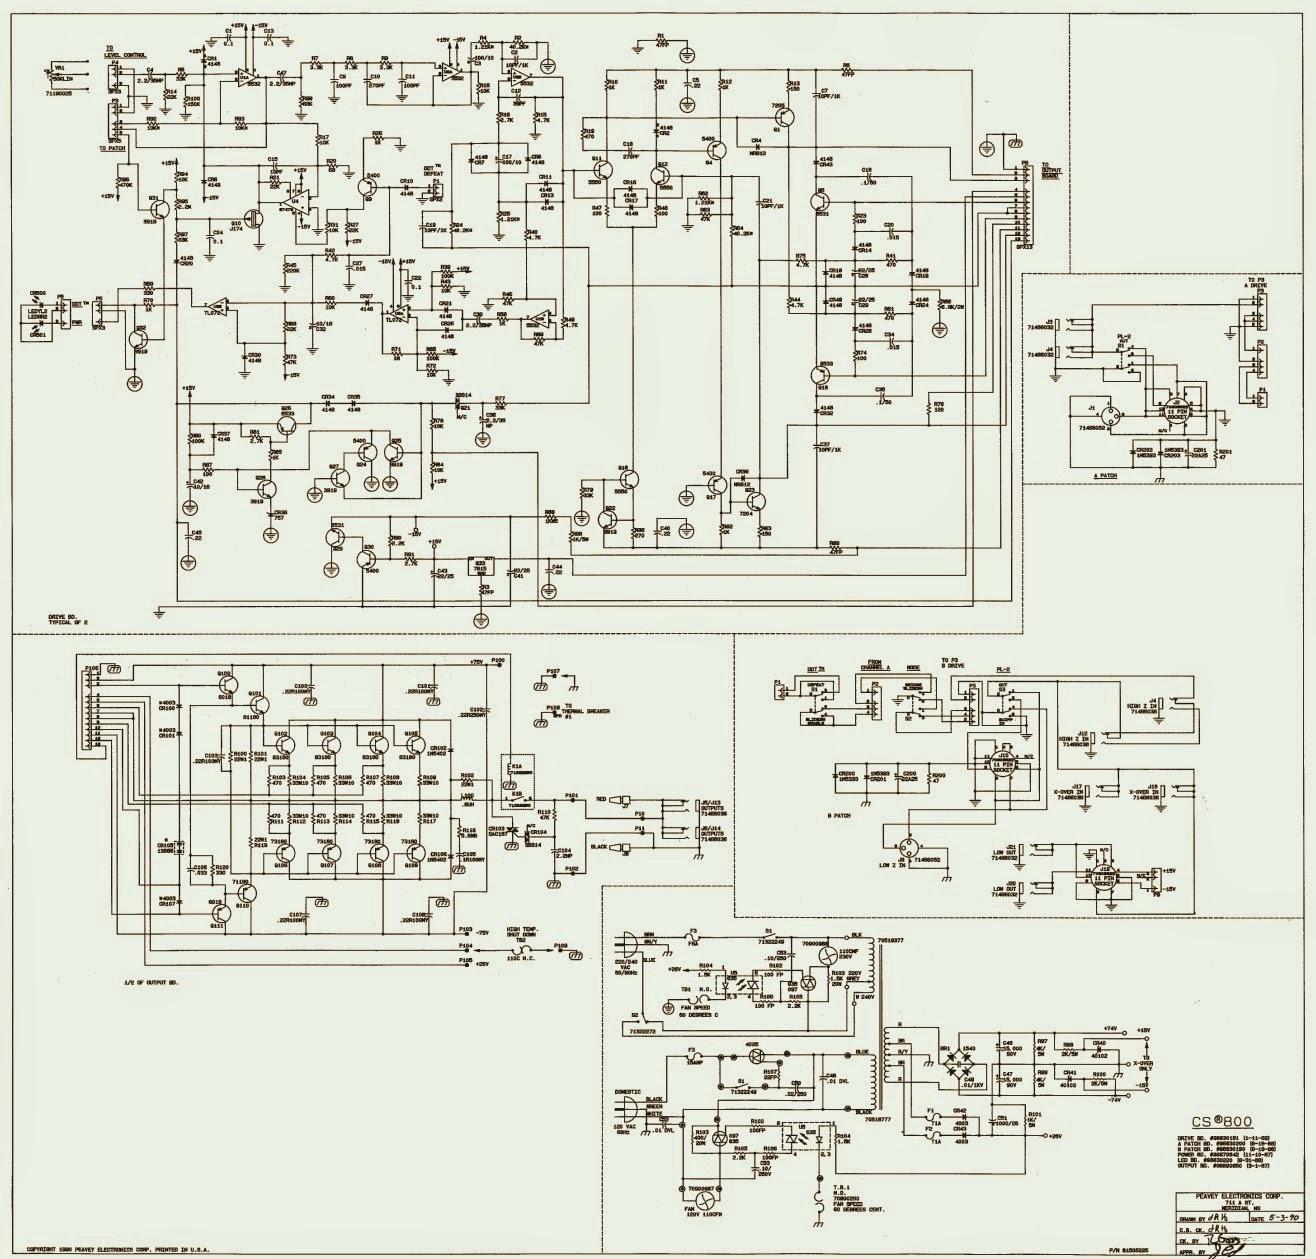 hight resolution of peavey cs 800 diagram schematic wiring diagrams u2022 gibson wiring diagrams peavey wiring diagrams